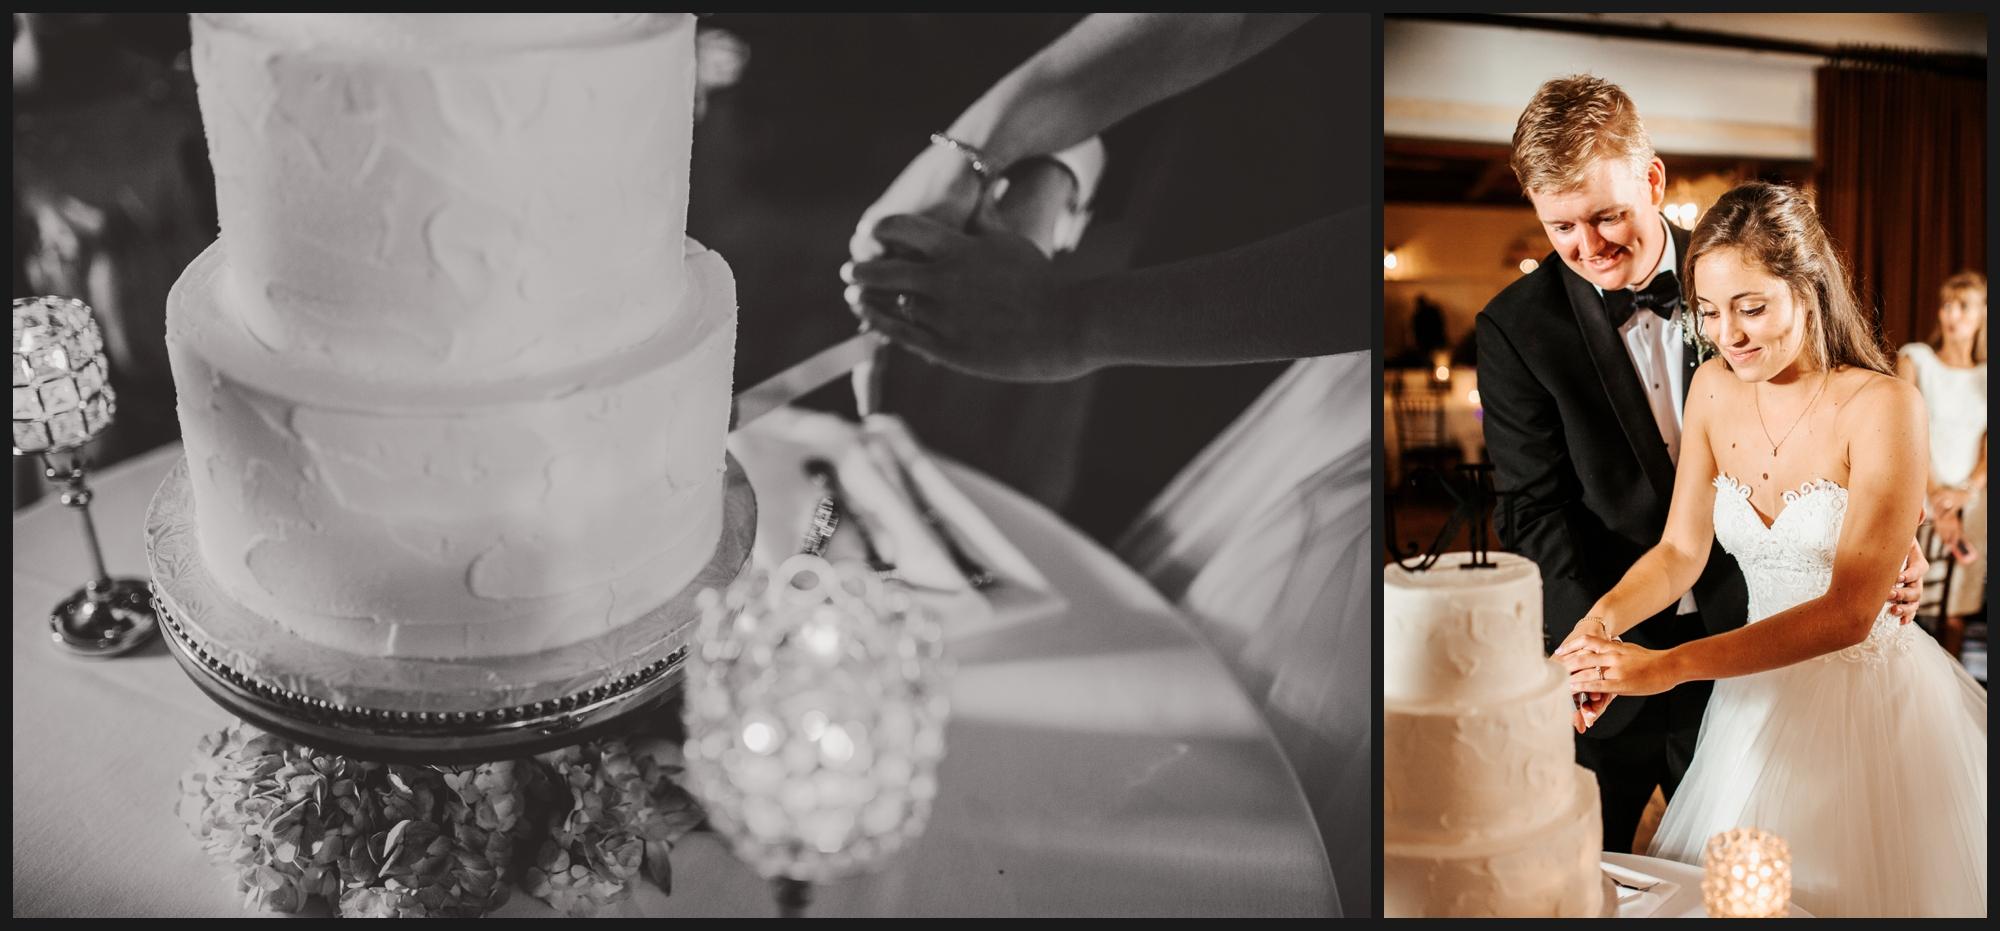 Orlando-Wedding-Photographer-destination-wedding-photographer-florida-wedding-photographer-bohemian-wedding-photographer_0012.jpg